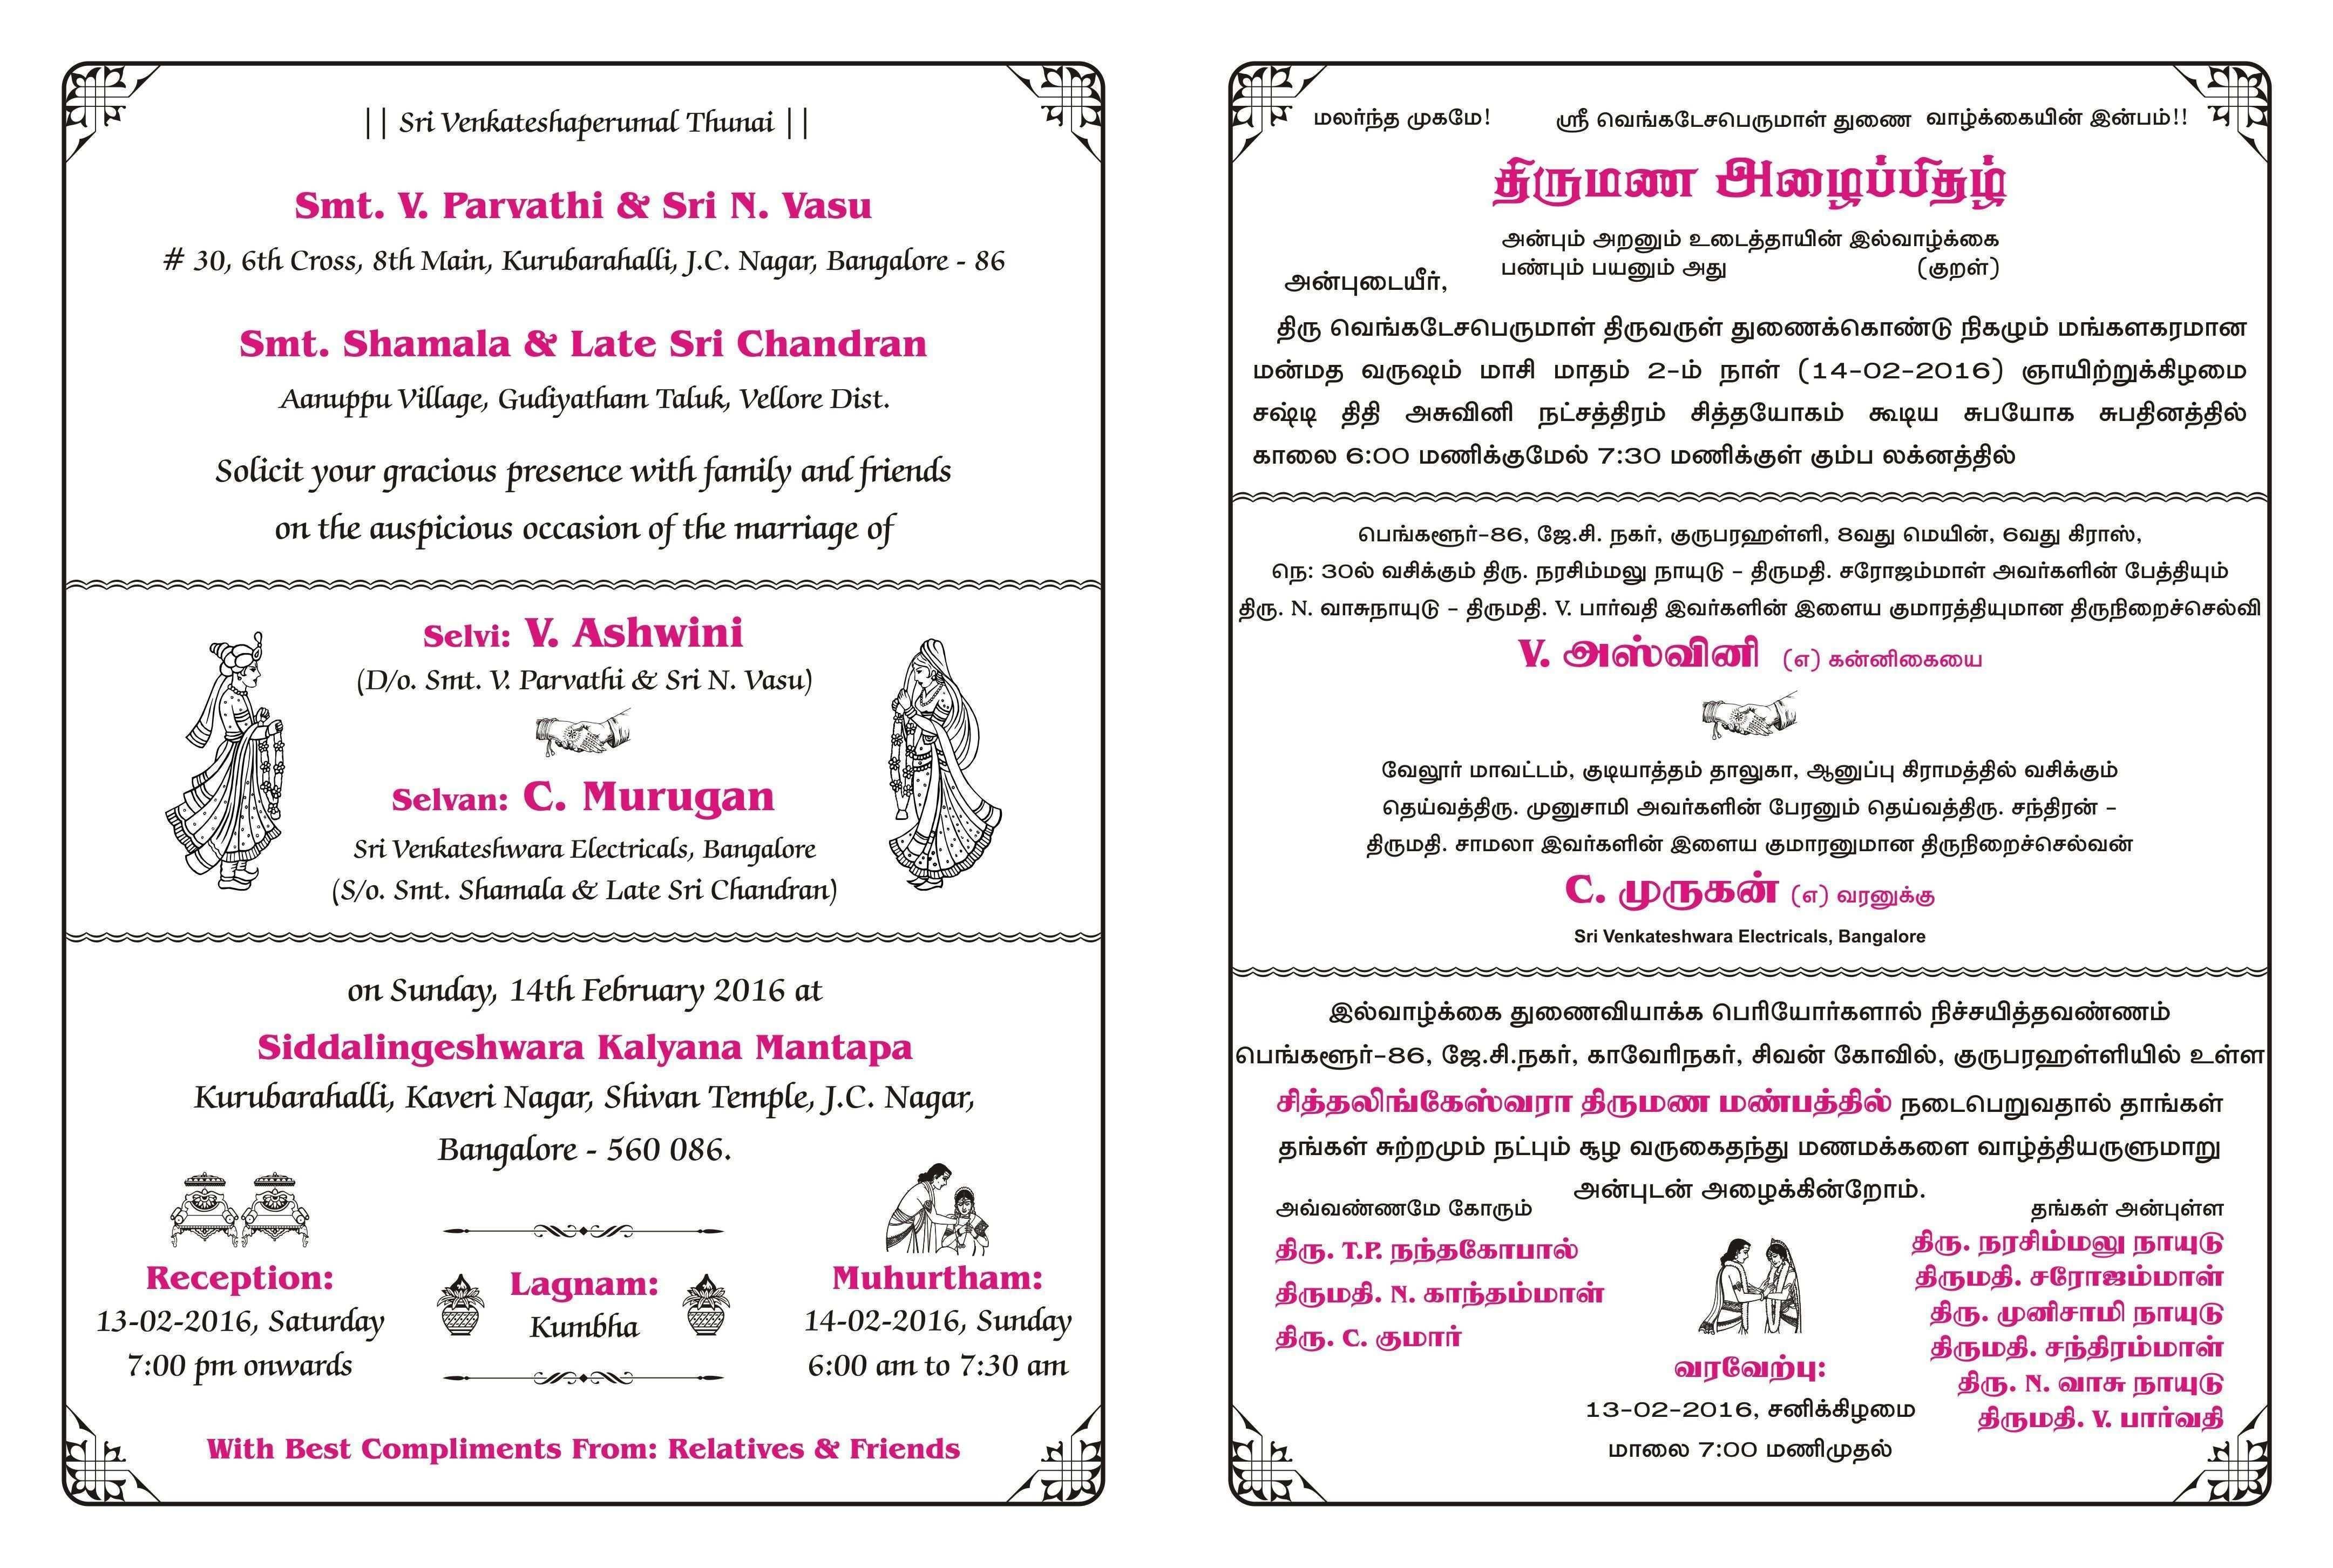 10 Wedding Invitation Templates In Tamil In 2020 Wedding Invitation Templates Marriage Invitations Reception Invitation Wording